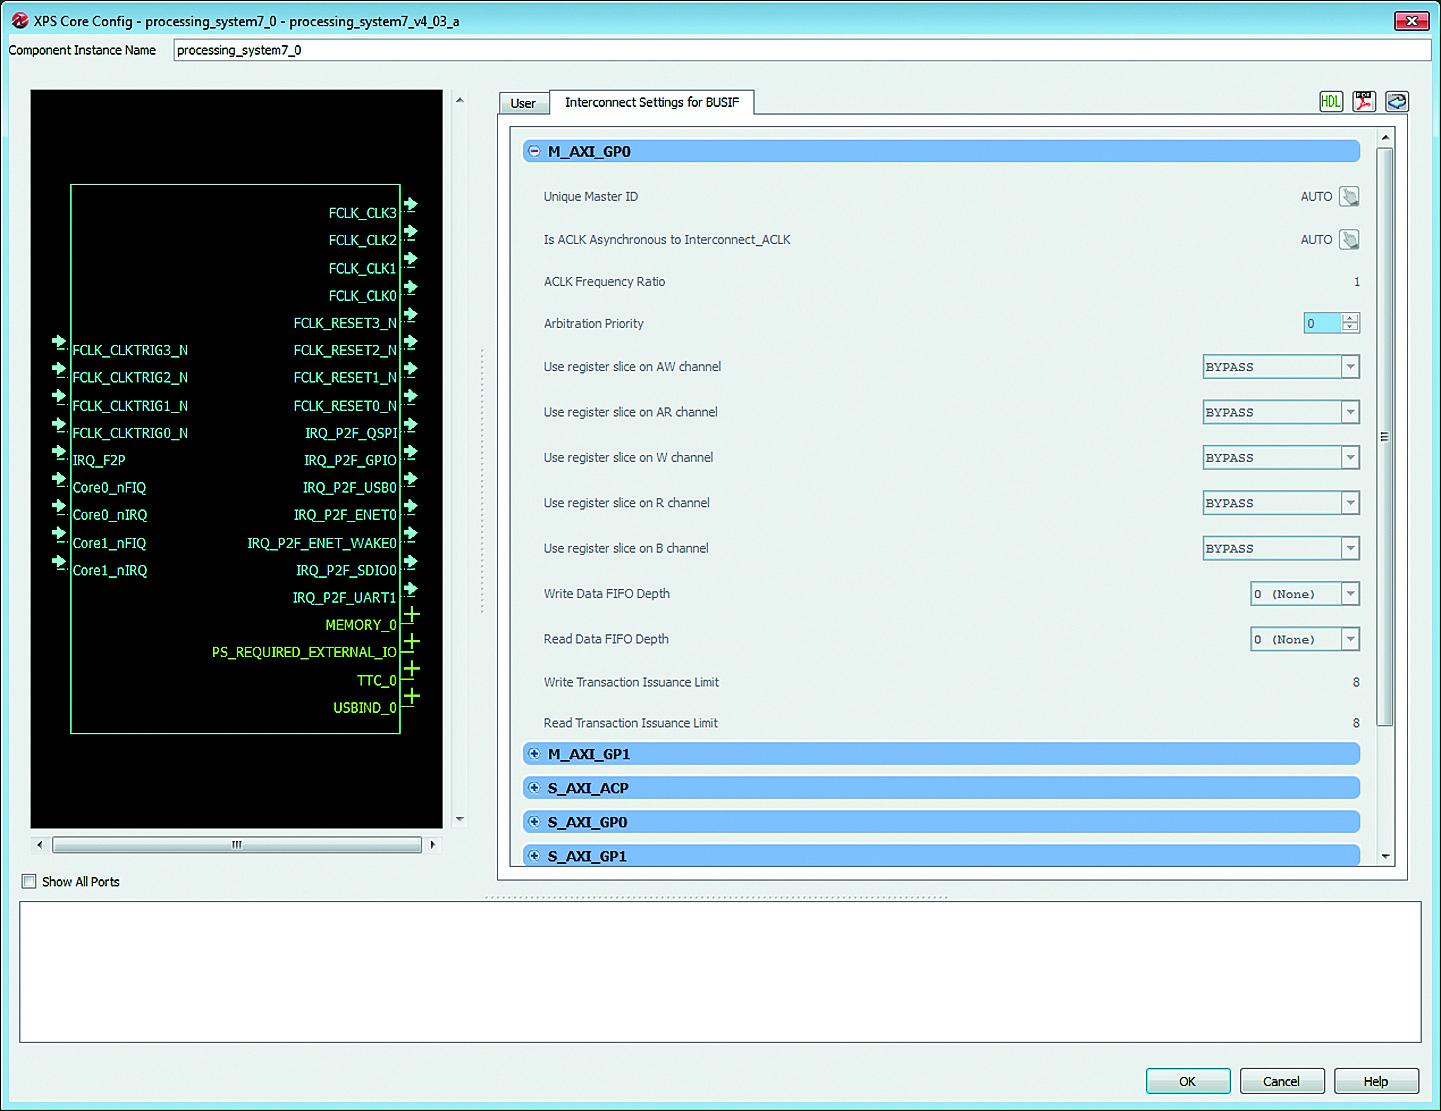 Установка параметров настройки портов интерфейса AXI